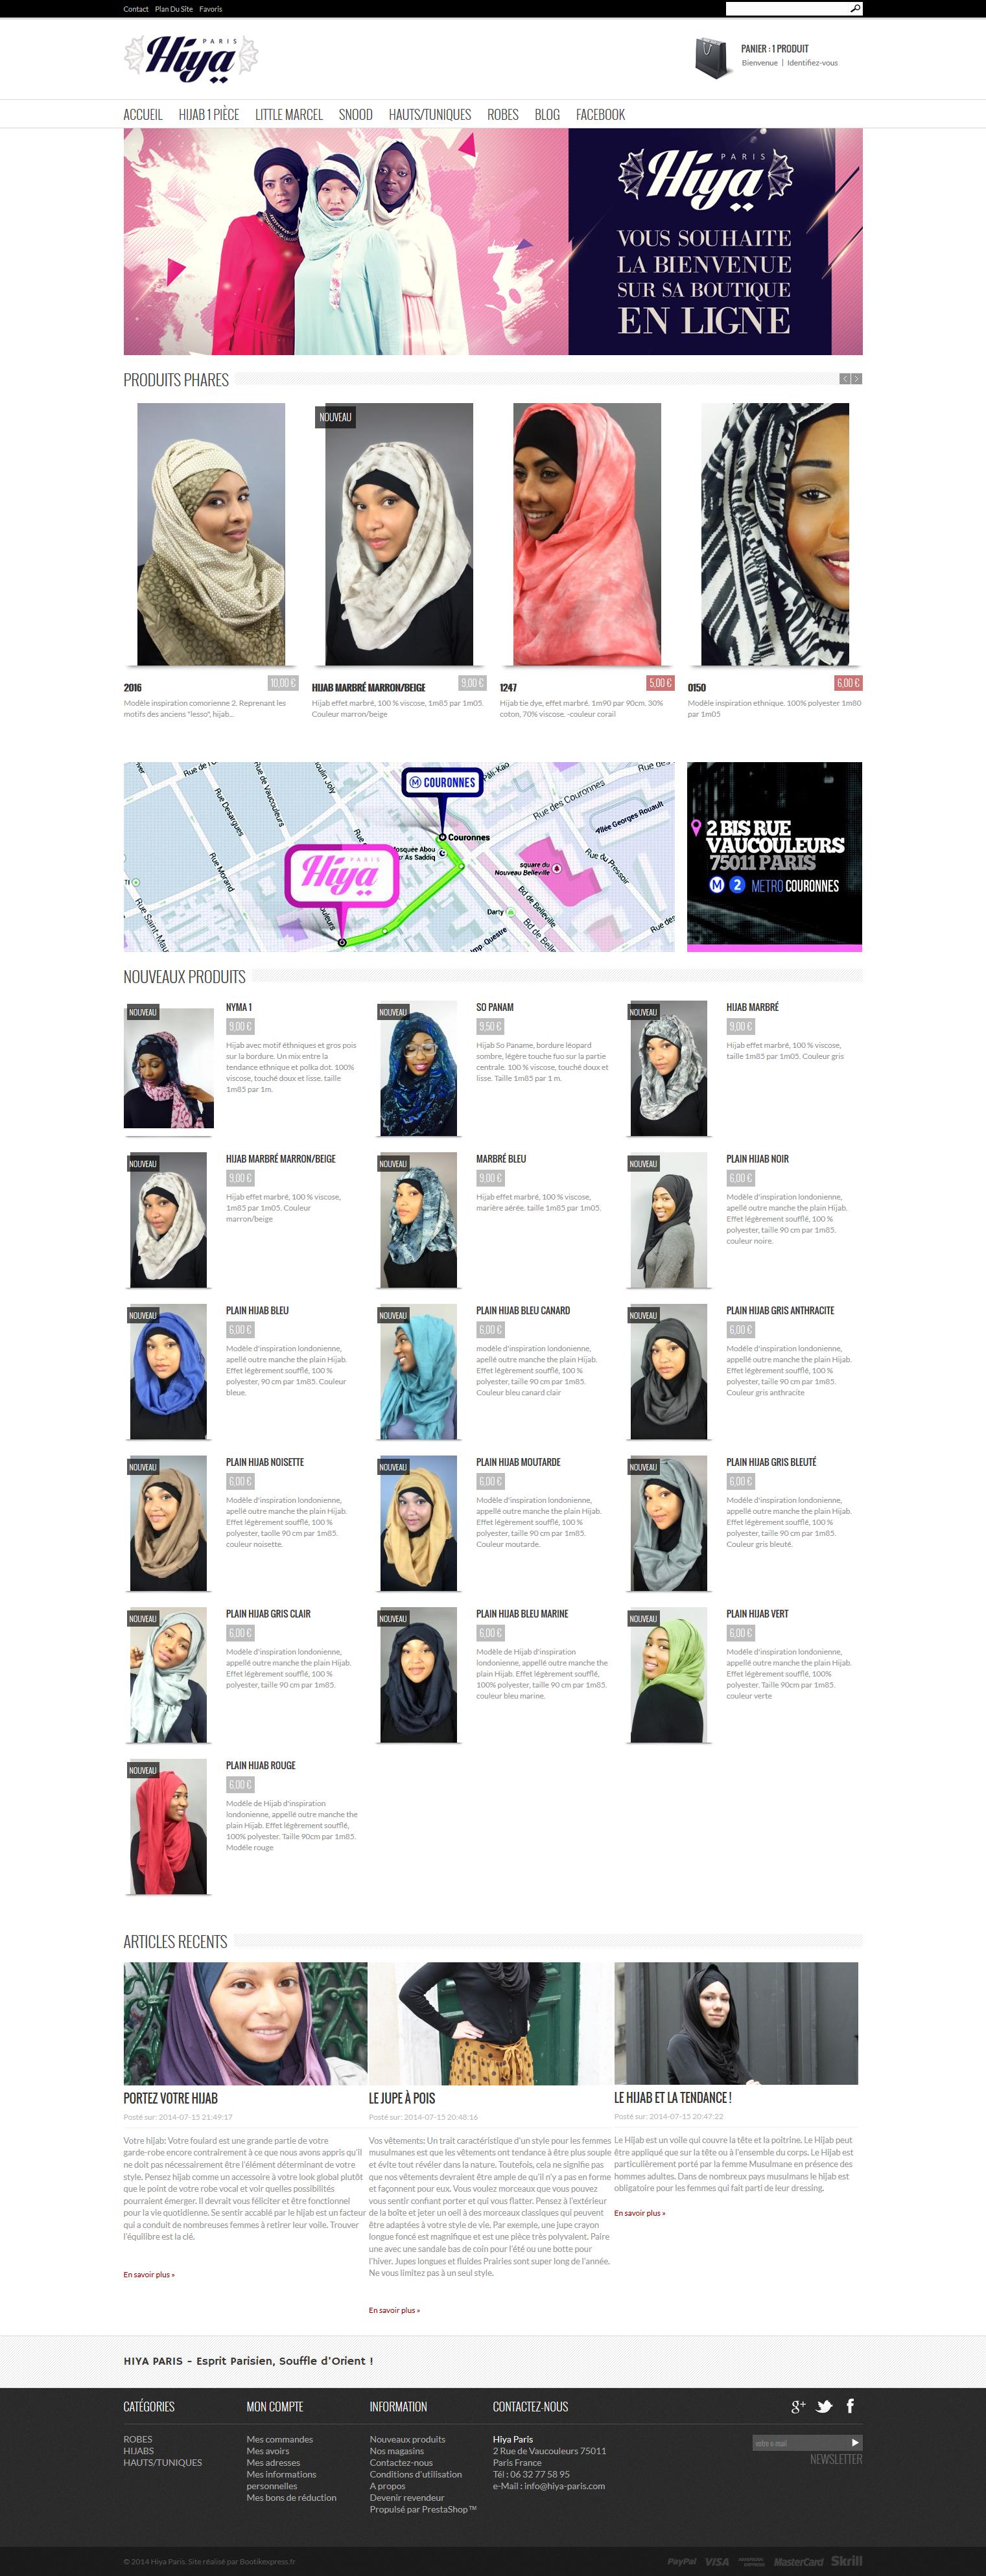 Site PrestaShop Muslim Hiya Paris